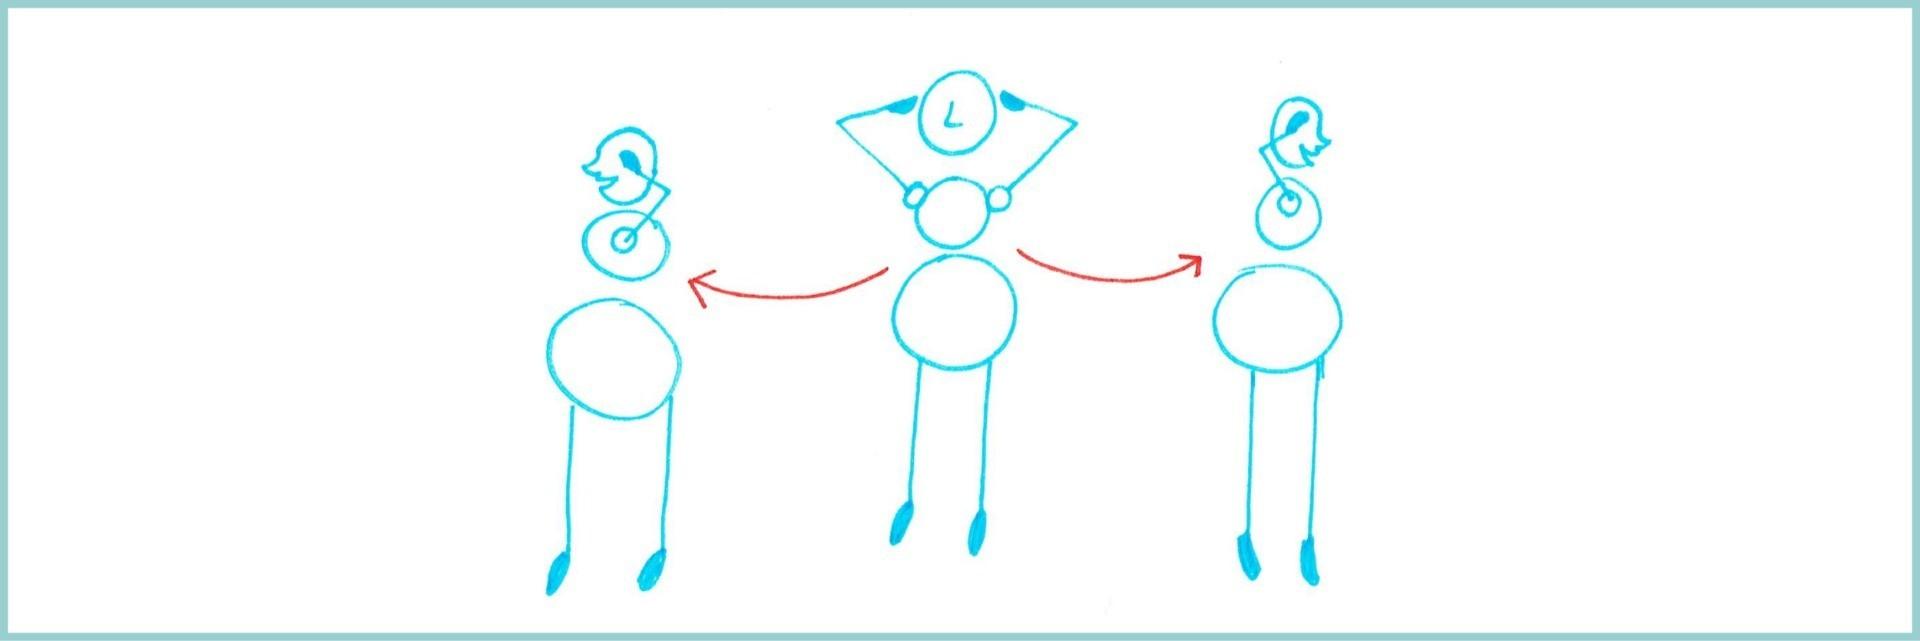 grafiken nackenschmerzen-rahmen3.jpg